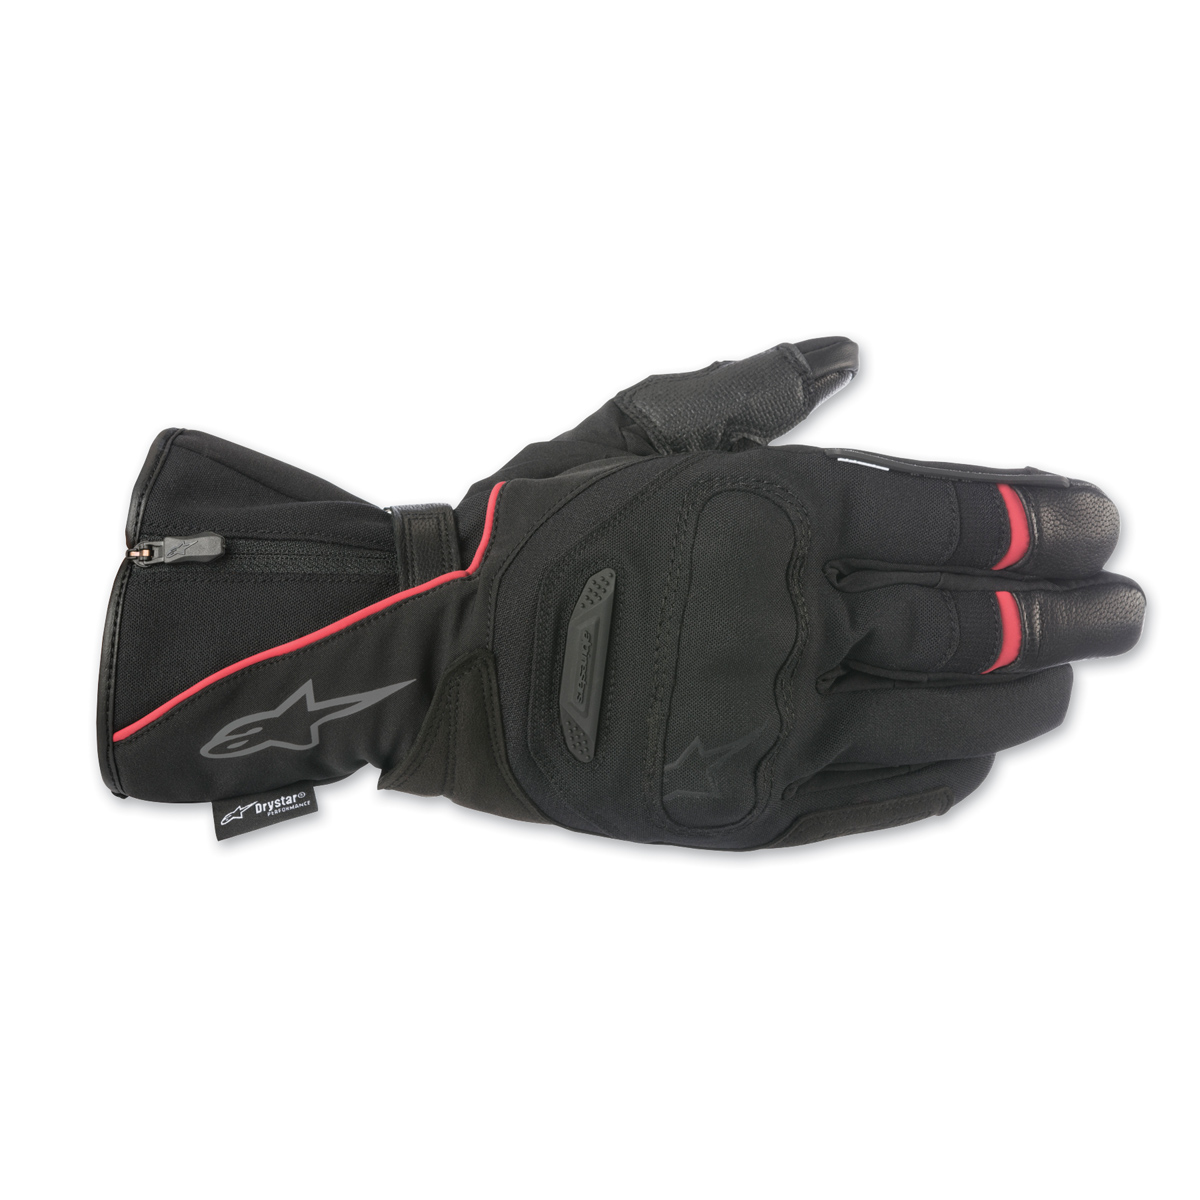 Alpinestars Men's Primer Drystar Black/Red Leather Gloves